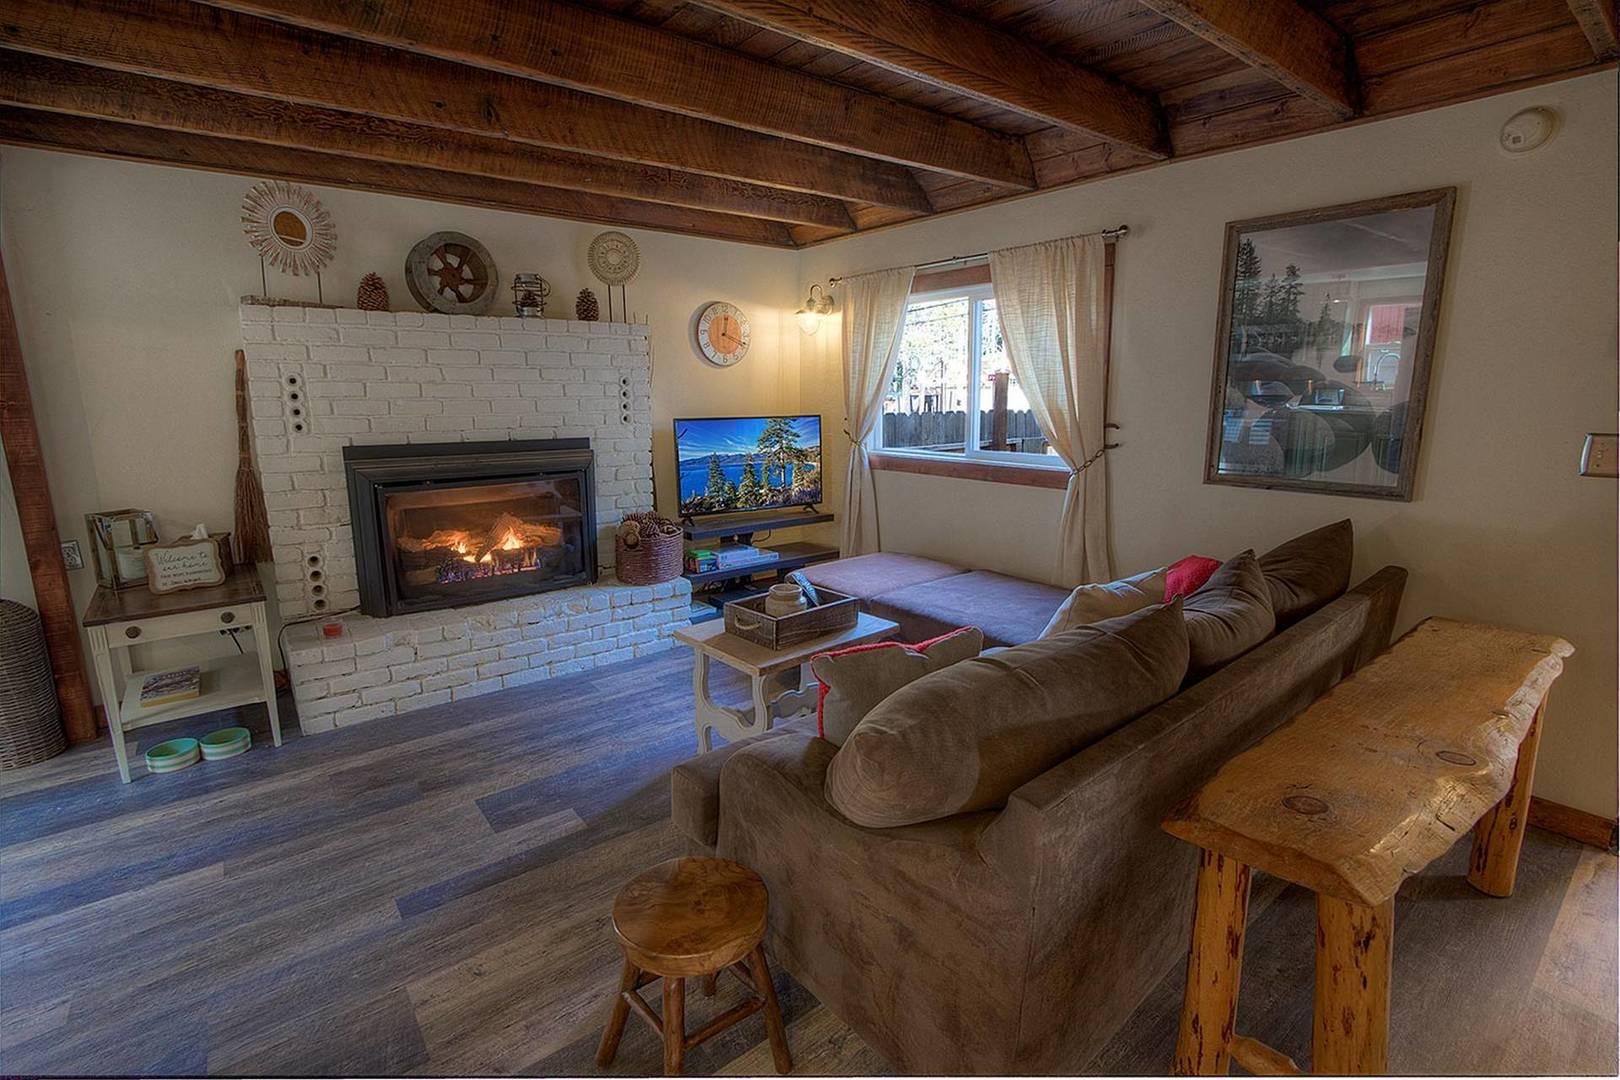 hch0648 living room